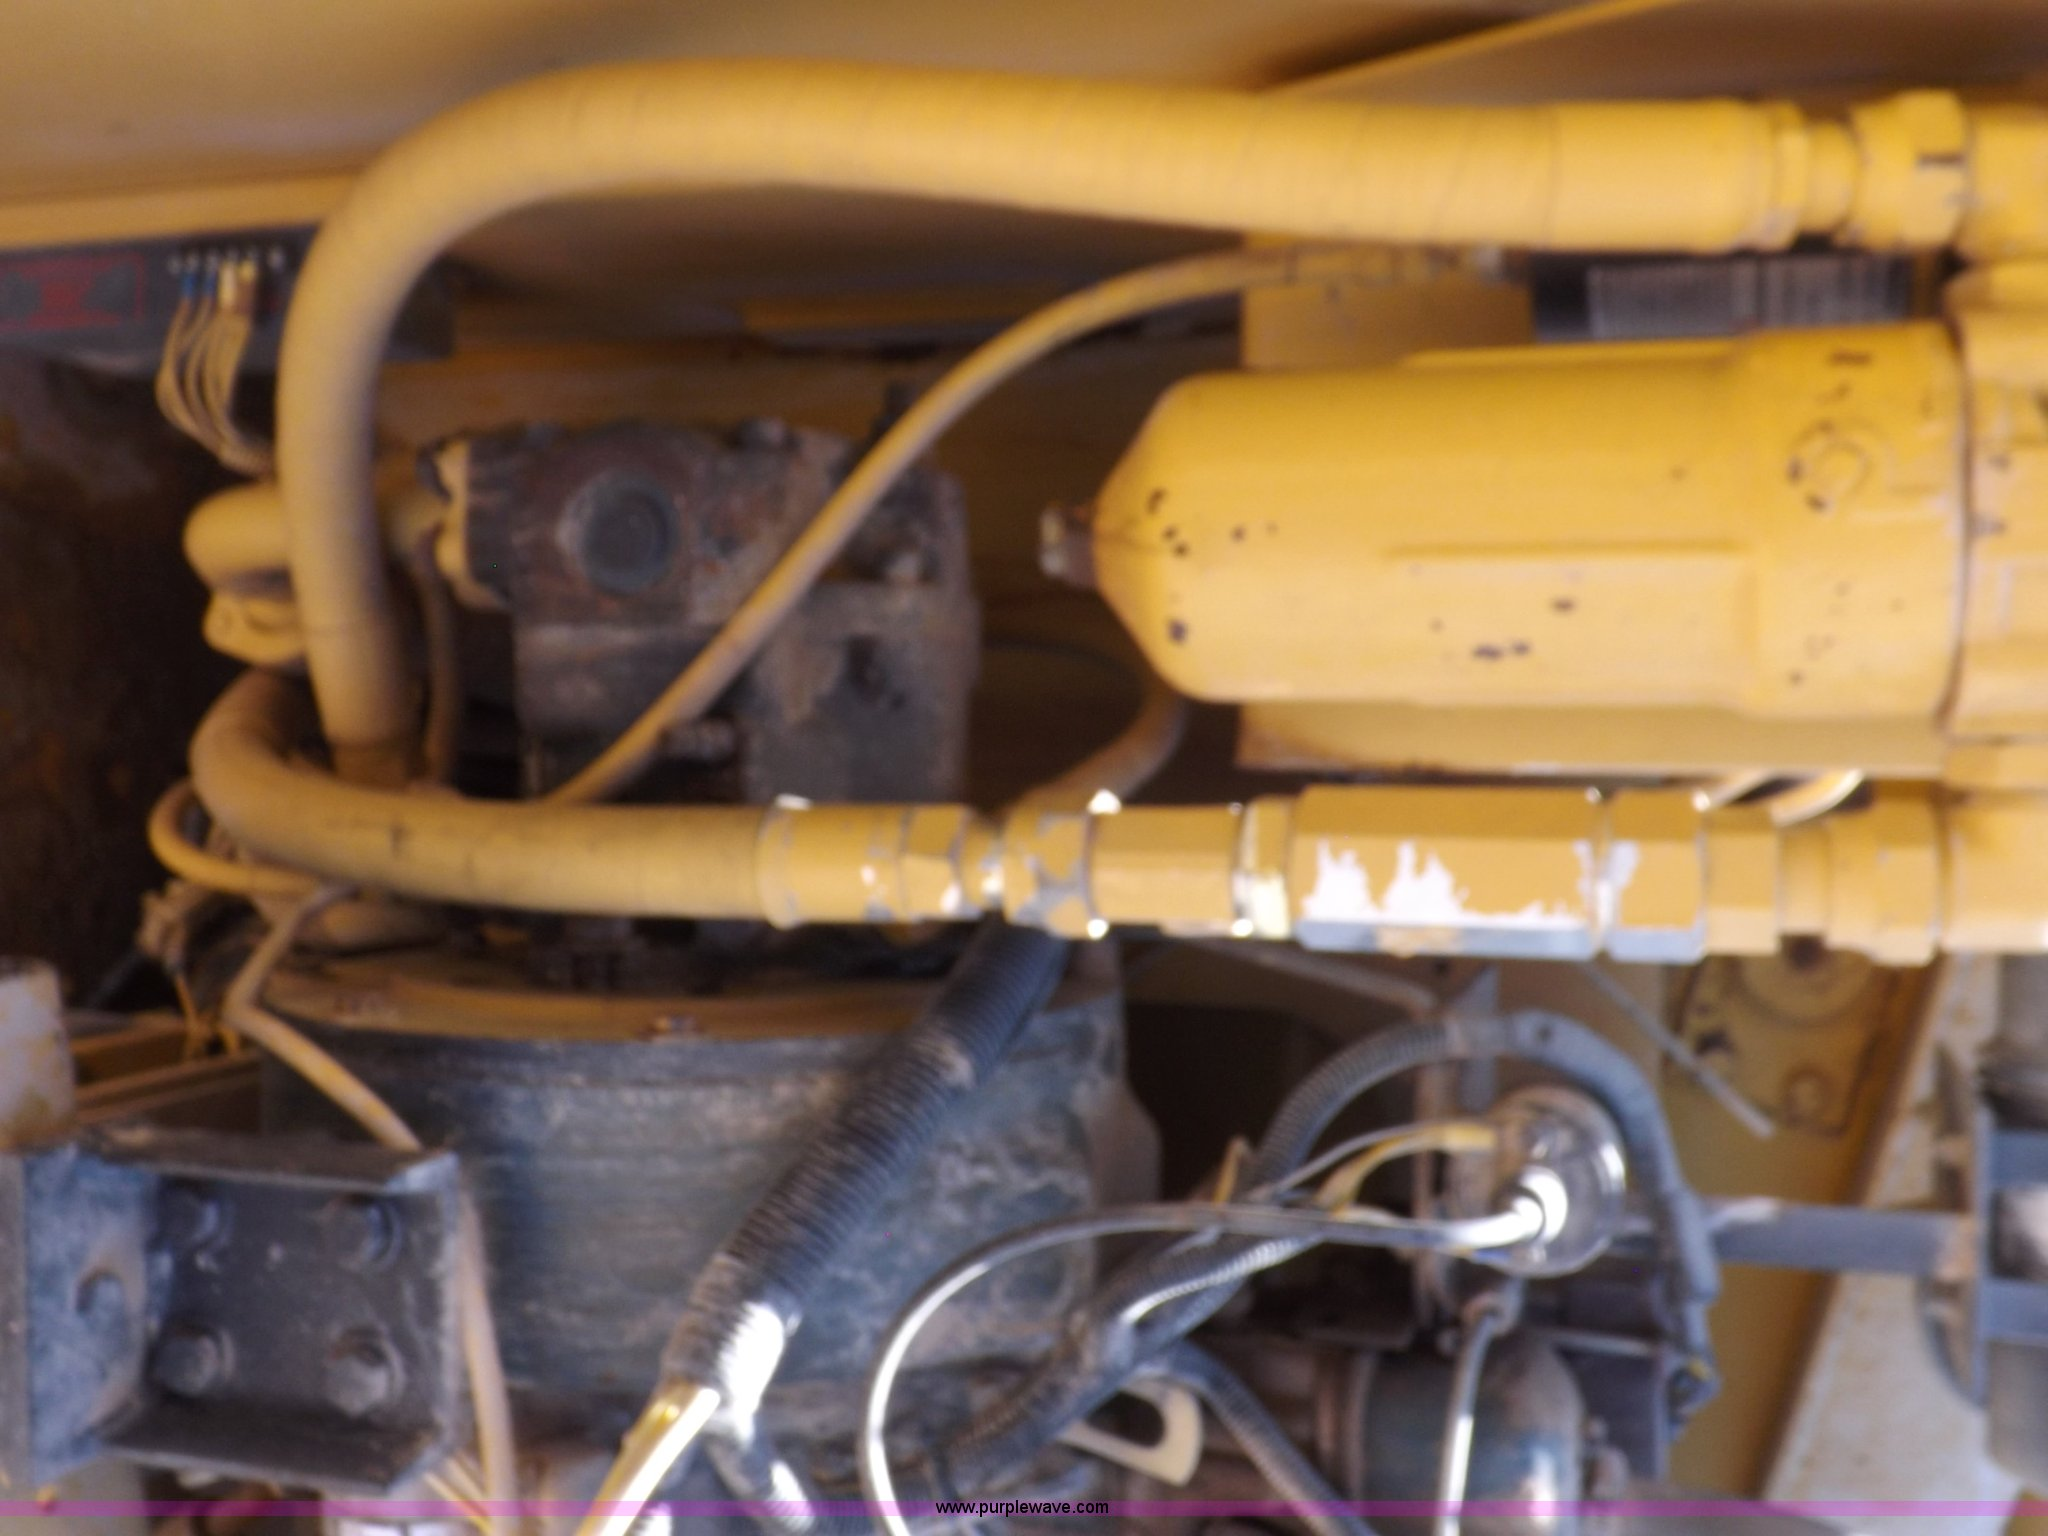 H9143K grove amz 66 articulating boom lift item h9143 sold! sep  at soozxer.org